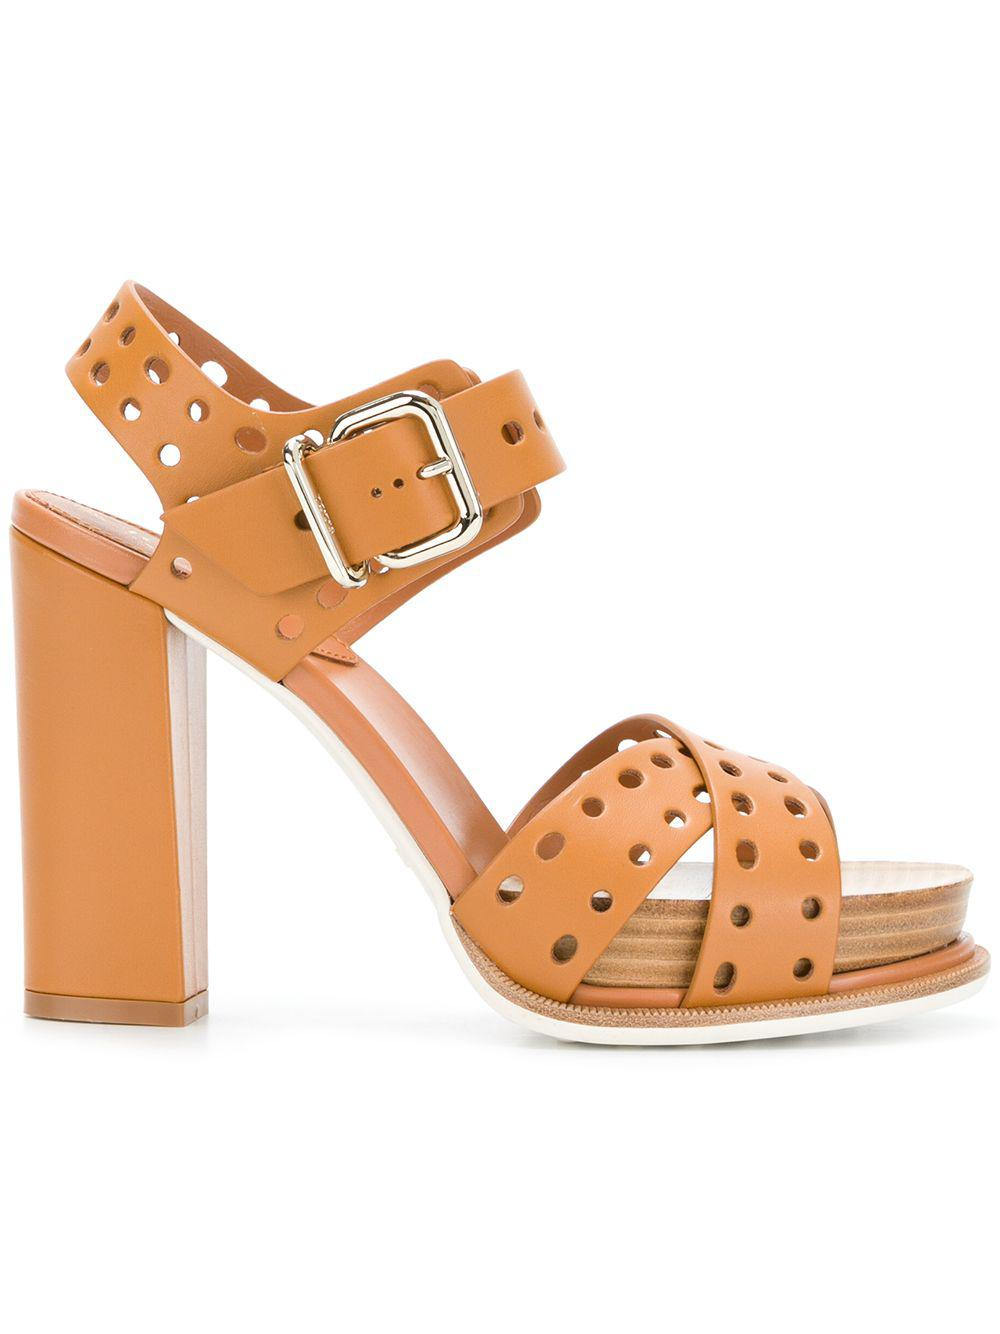 8d4108c79895 Tod s - Brown Perforated Platform Sandals - Lyst. View fullscreen